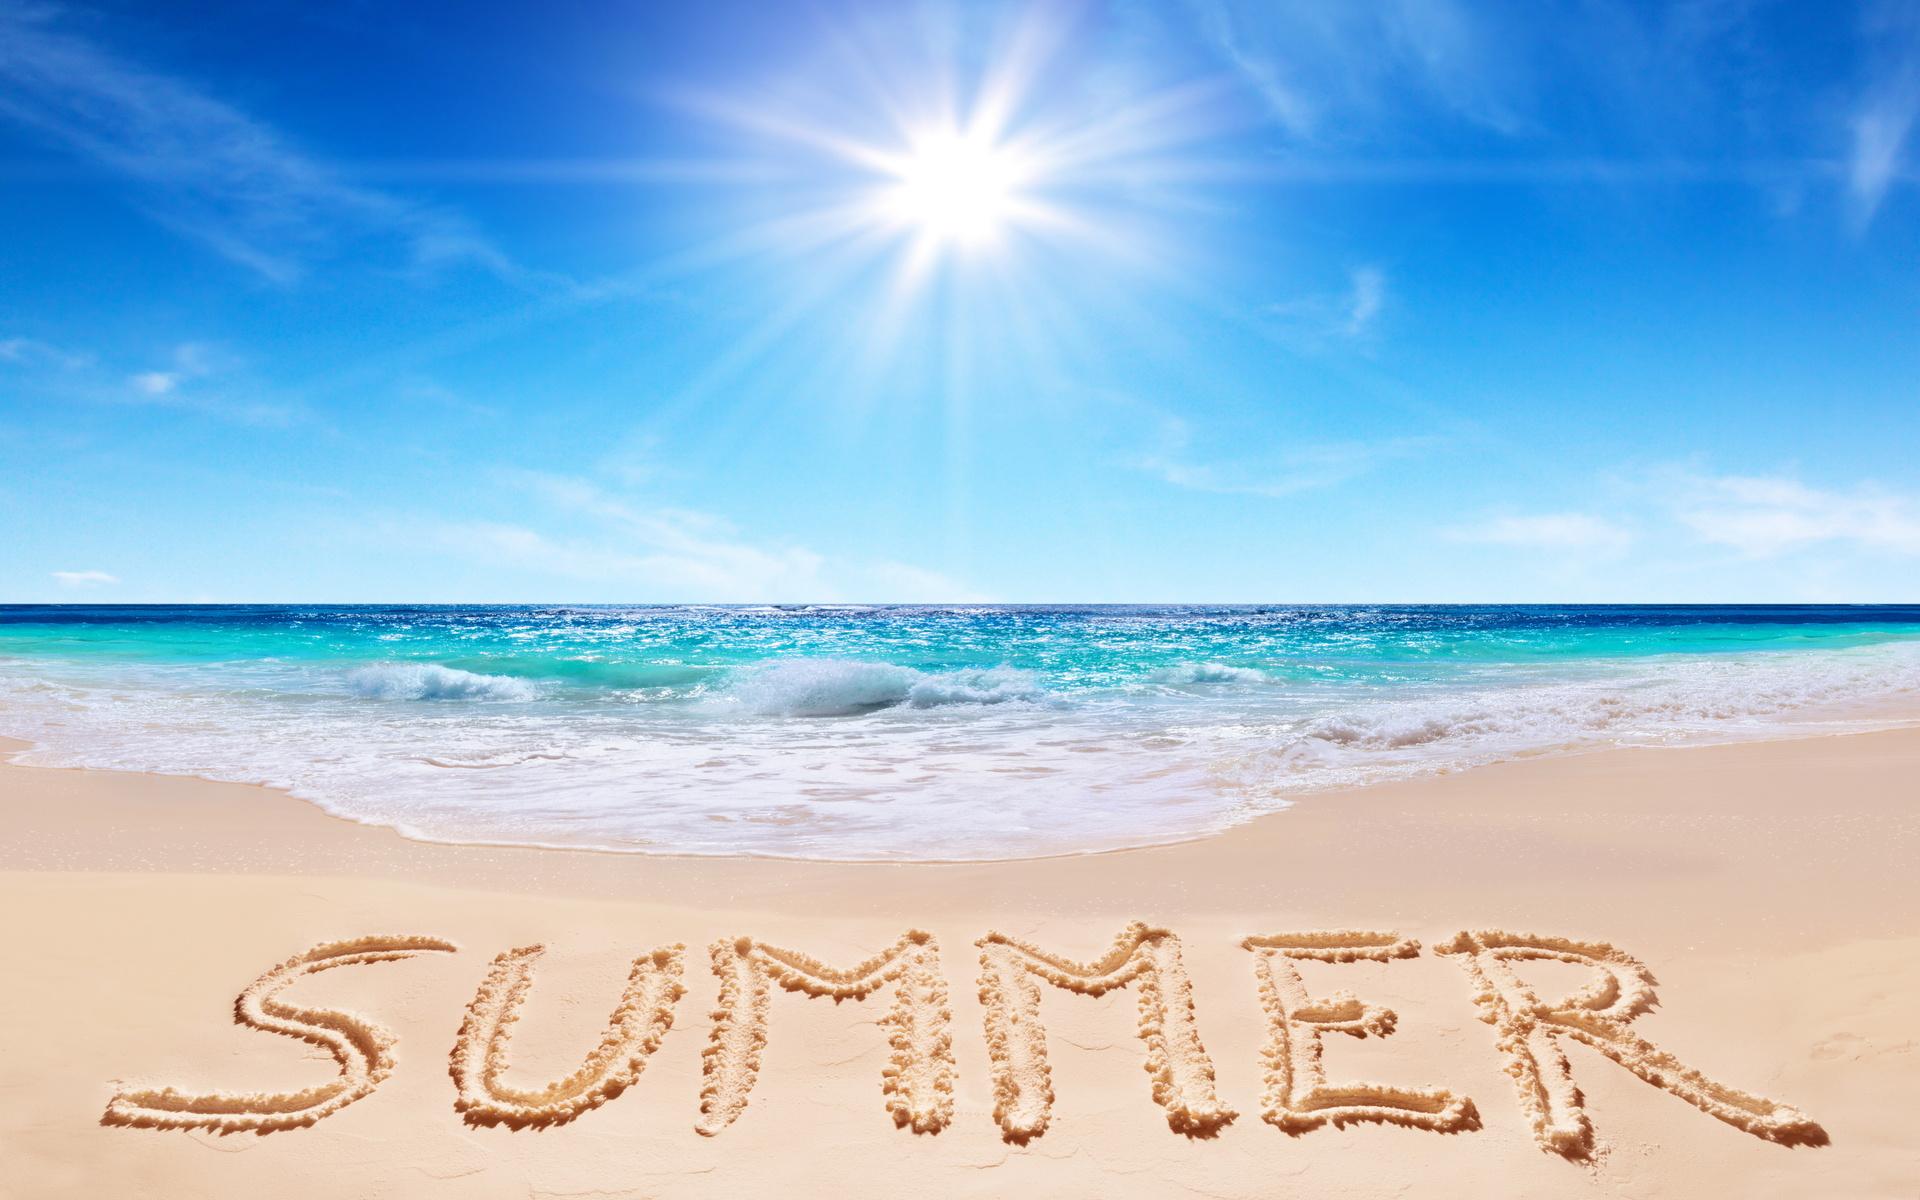 summer, лето, берег, пляж, песок, солнце